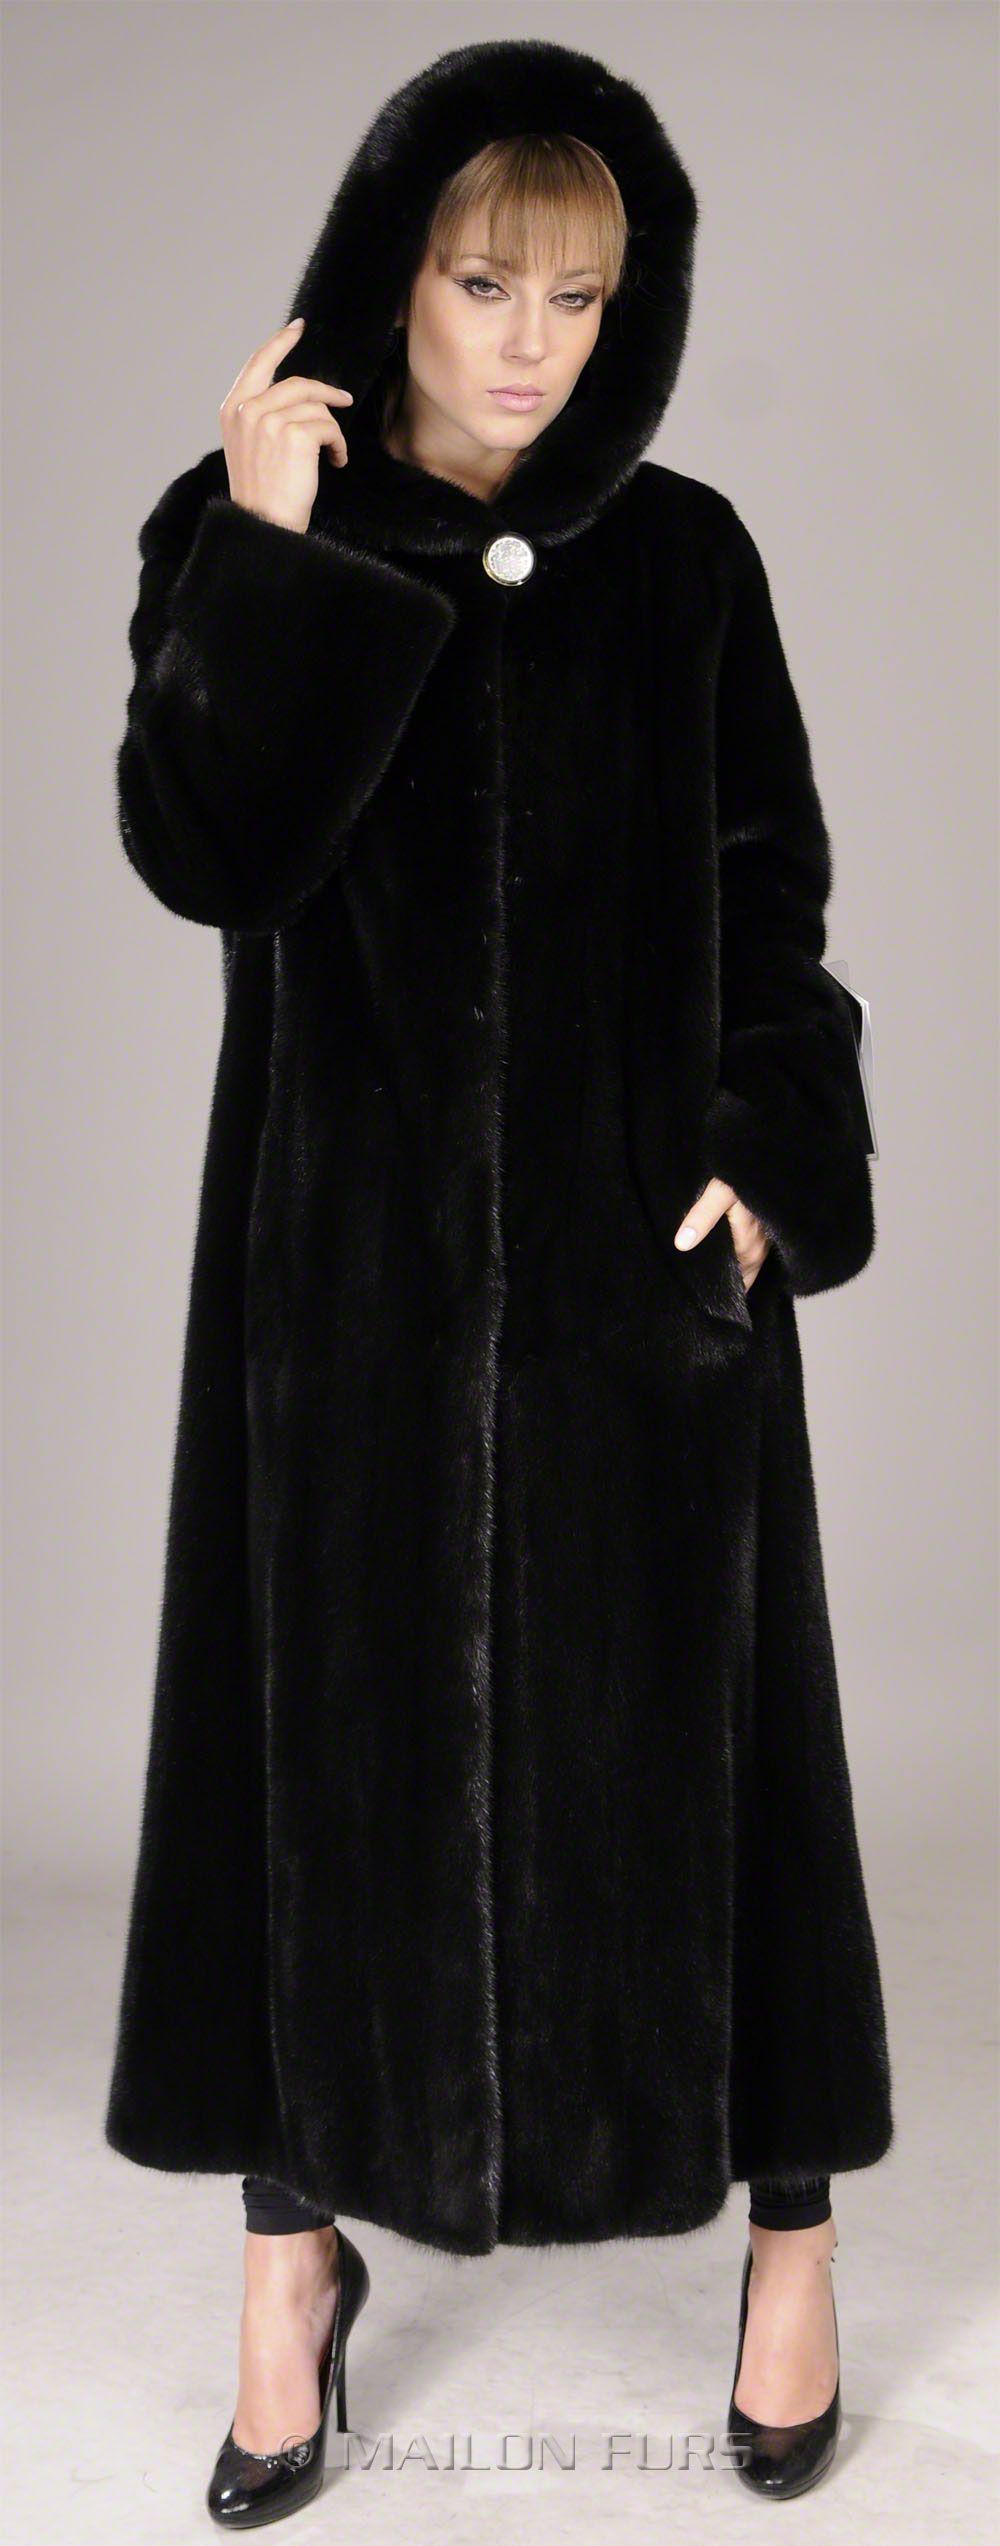 blackglama mink coat with hood - Google Search | Mink | Pinterest ...